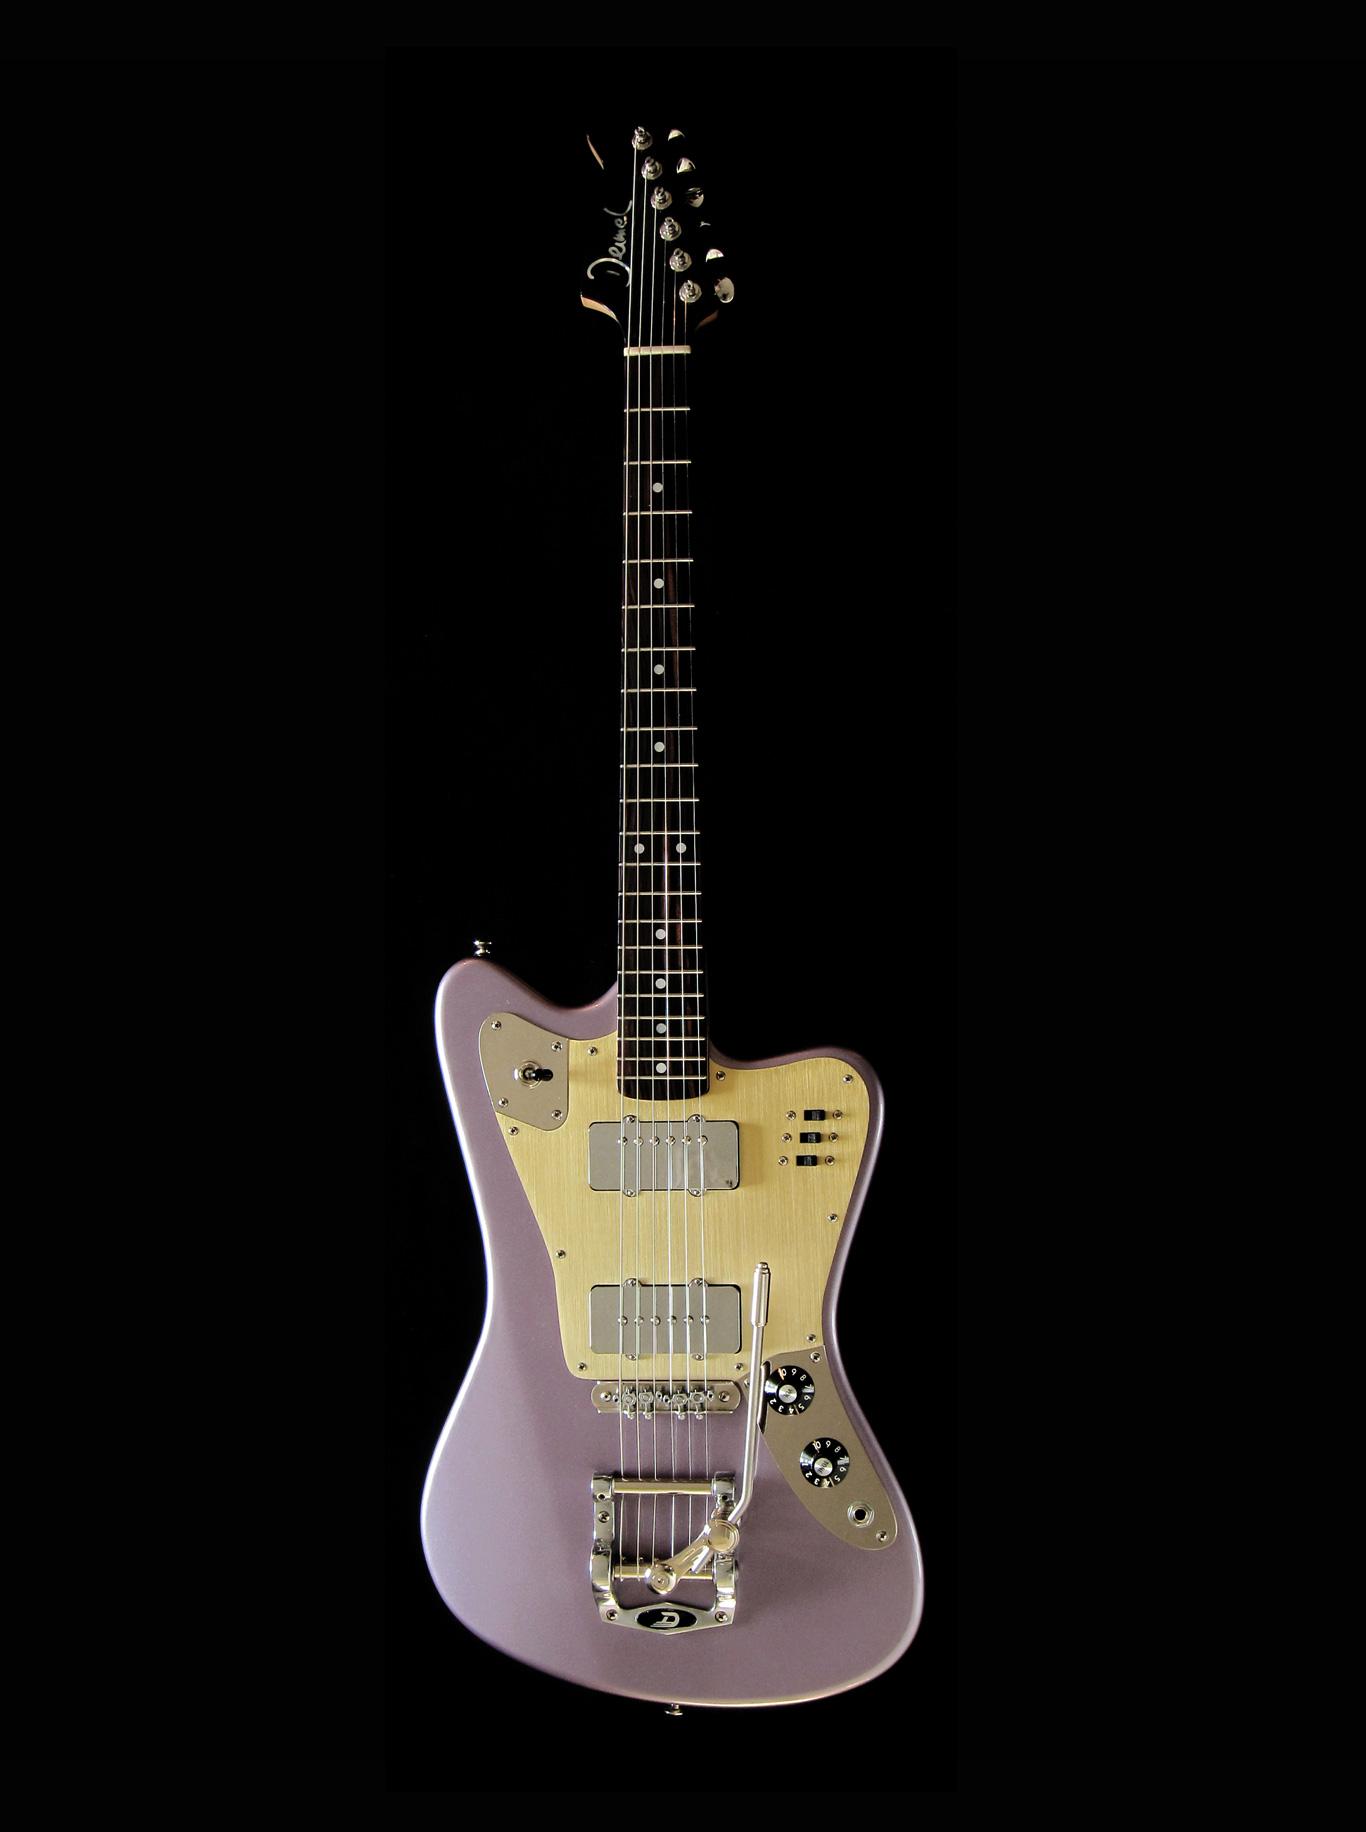 Deimel Firestar »Classic«, Color »Saturn Lavender«